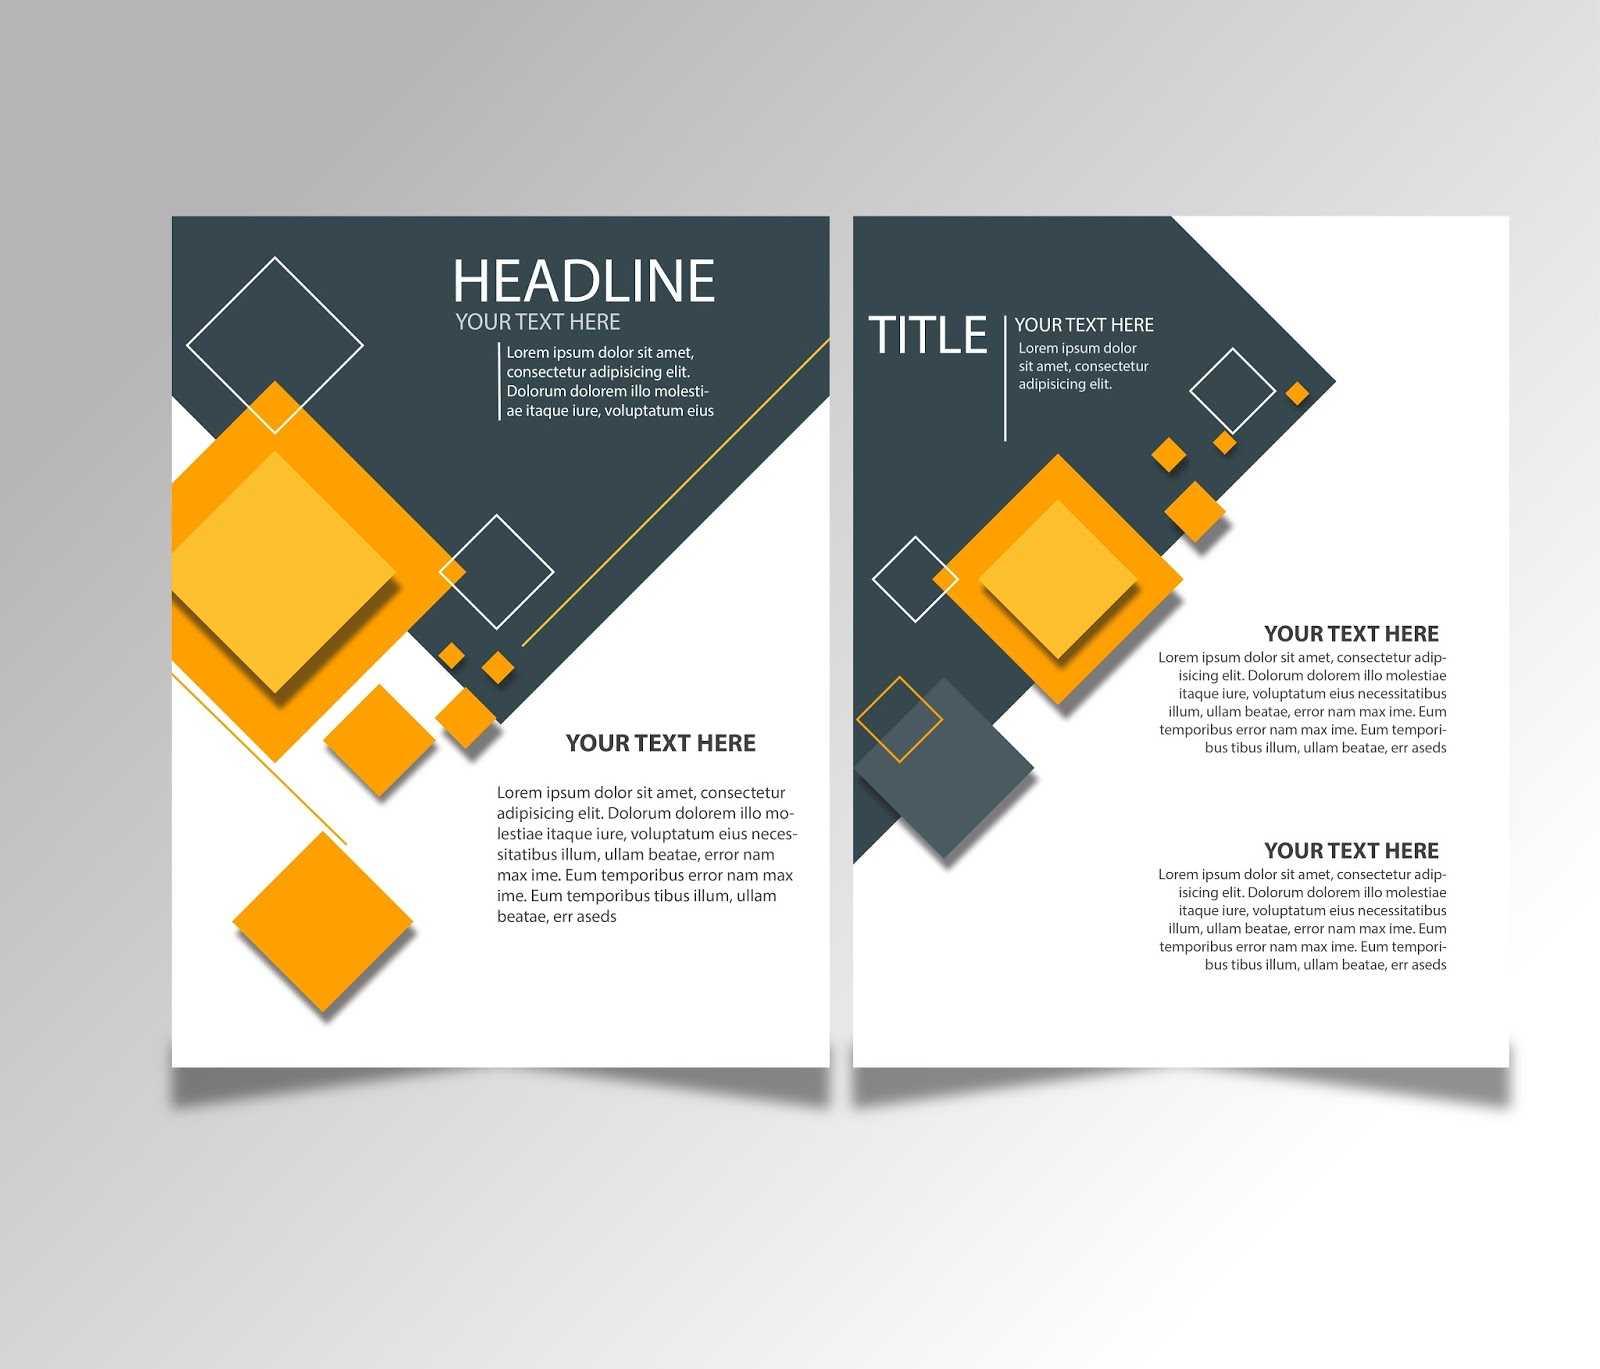 Free Download Brochure Design Templates Ai Files - Ideosprocess For Brochure Templates Ai Free Download